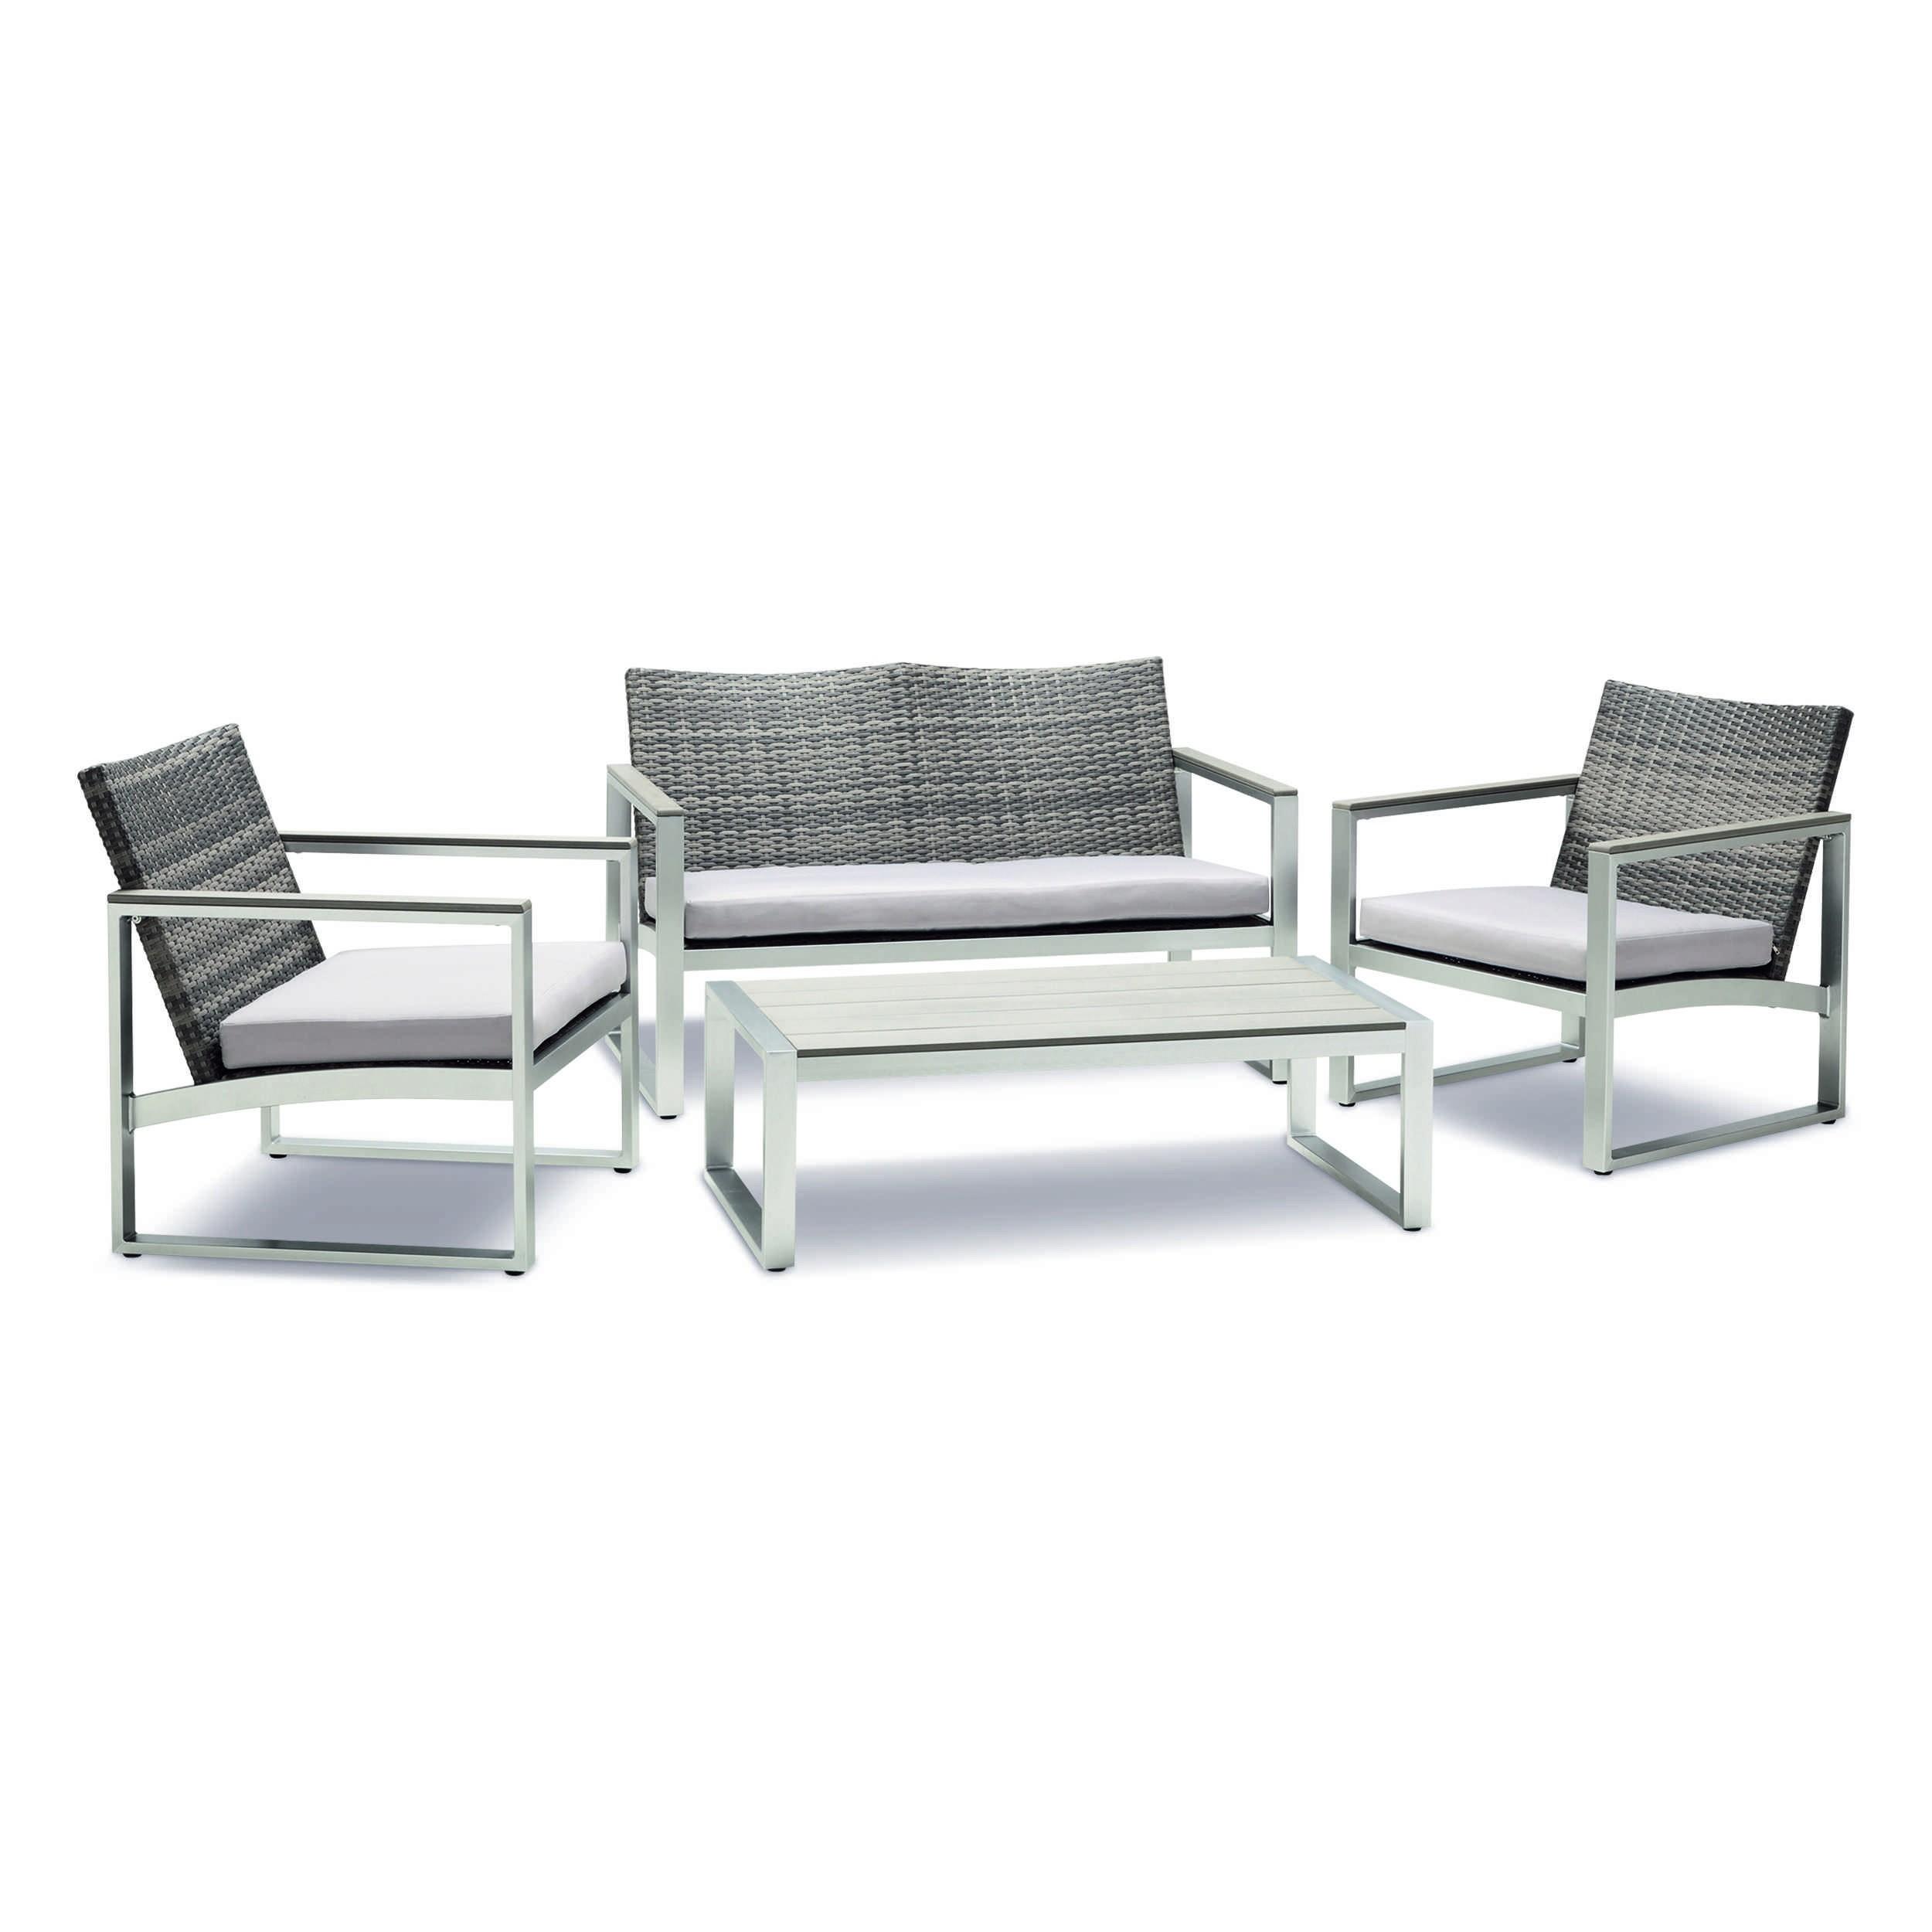 loungem bel set colon 4tlg aluminium defactodeal. Black Bedroom Furniture Sets. Home Design Ideas